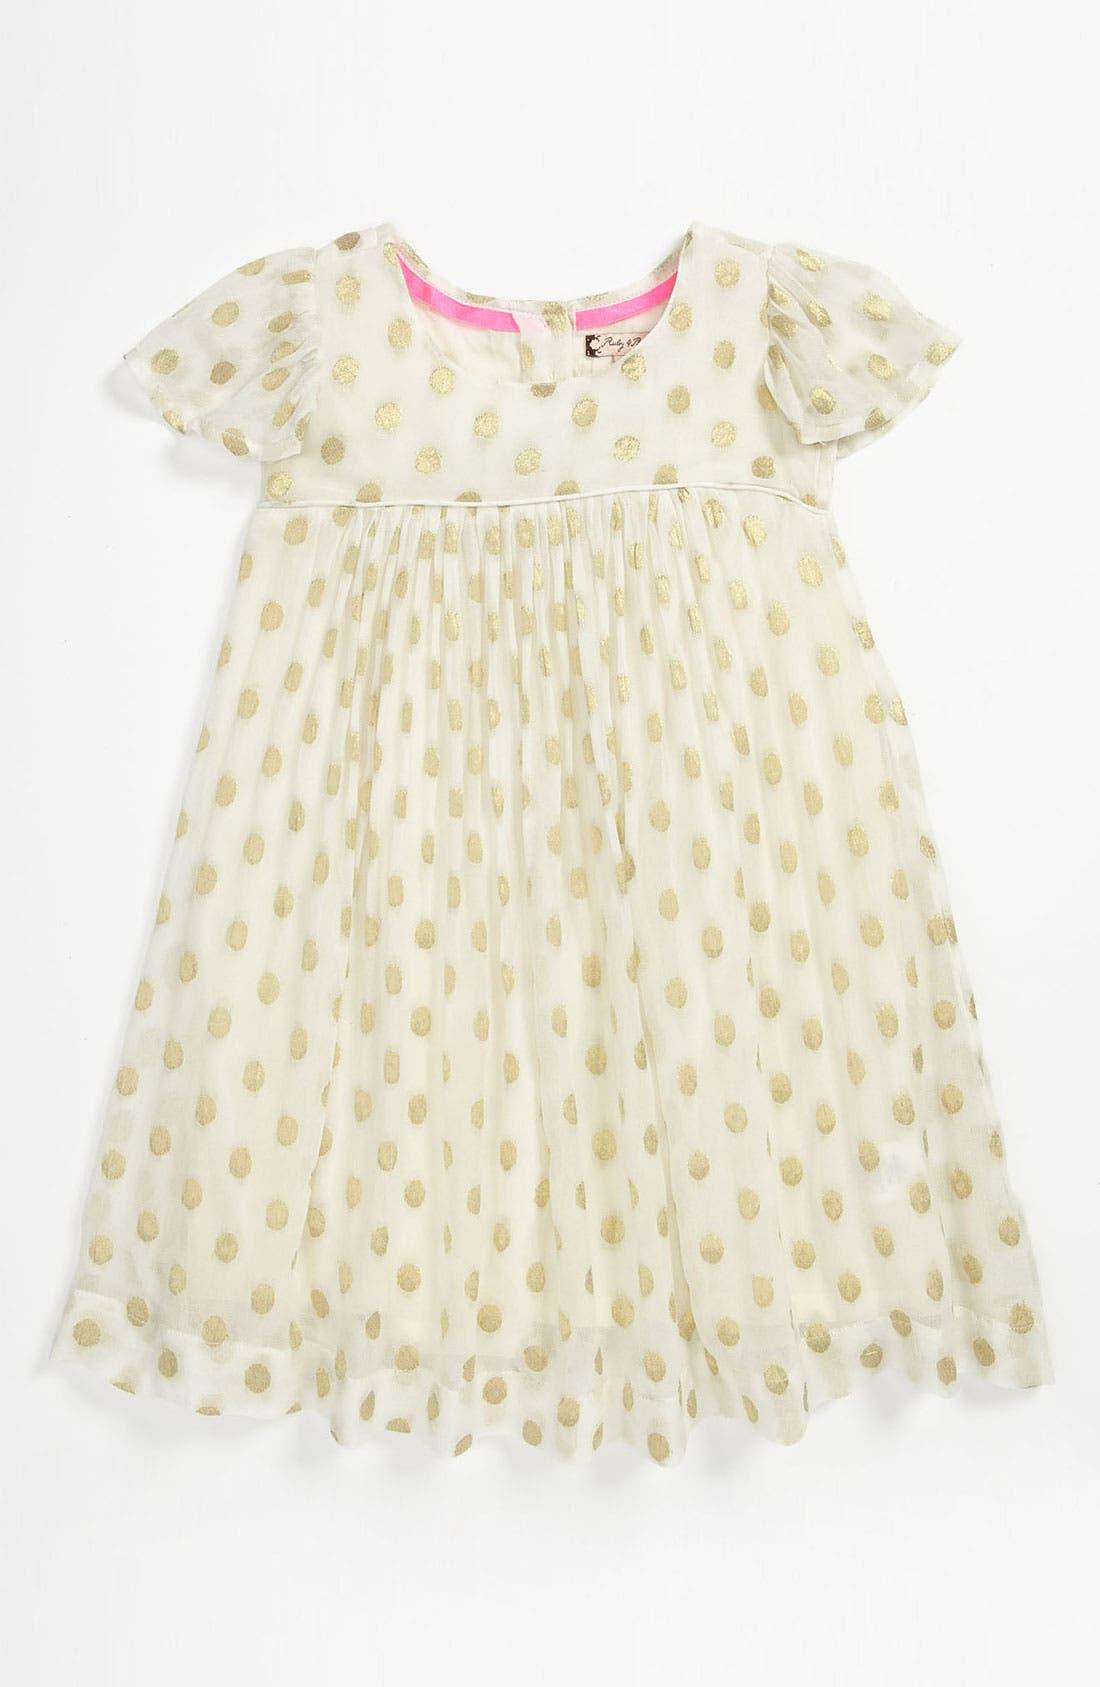 Main Image - Ruby & Bloom 'Tabitha' Dress (Toddler)